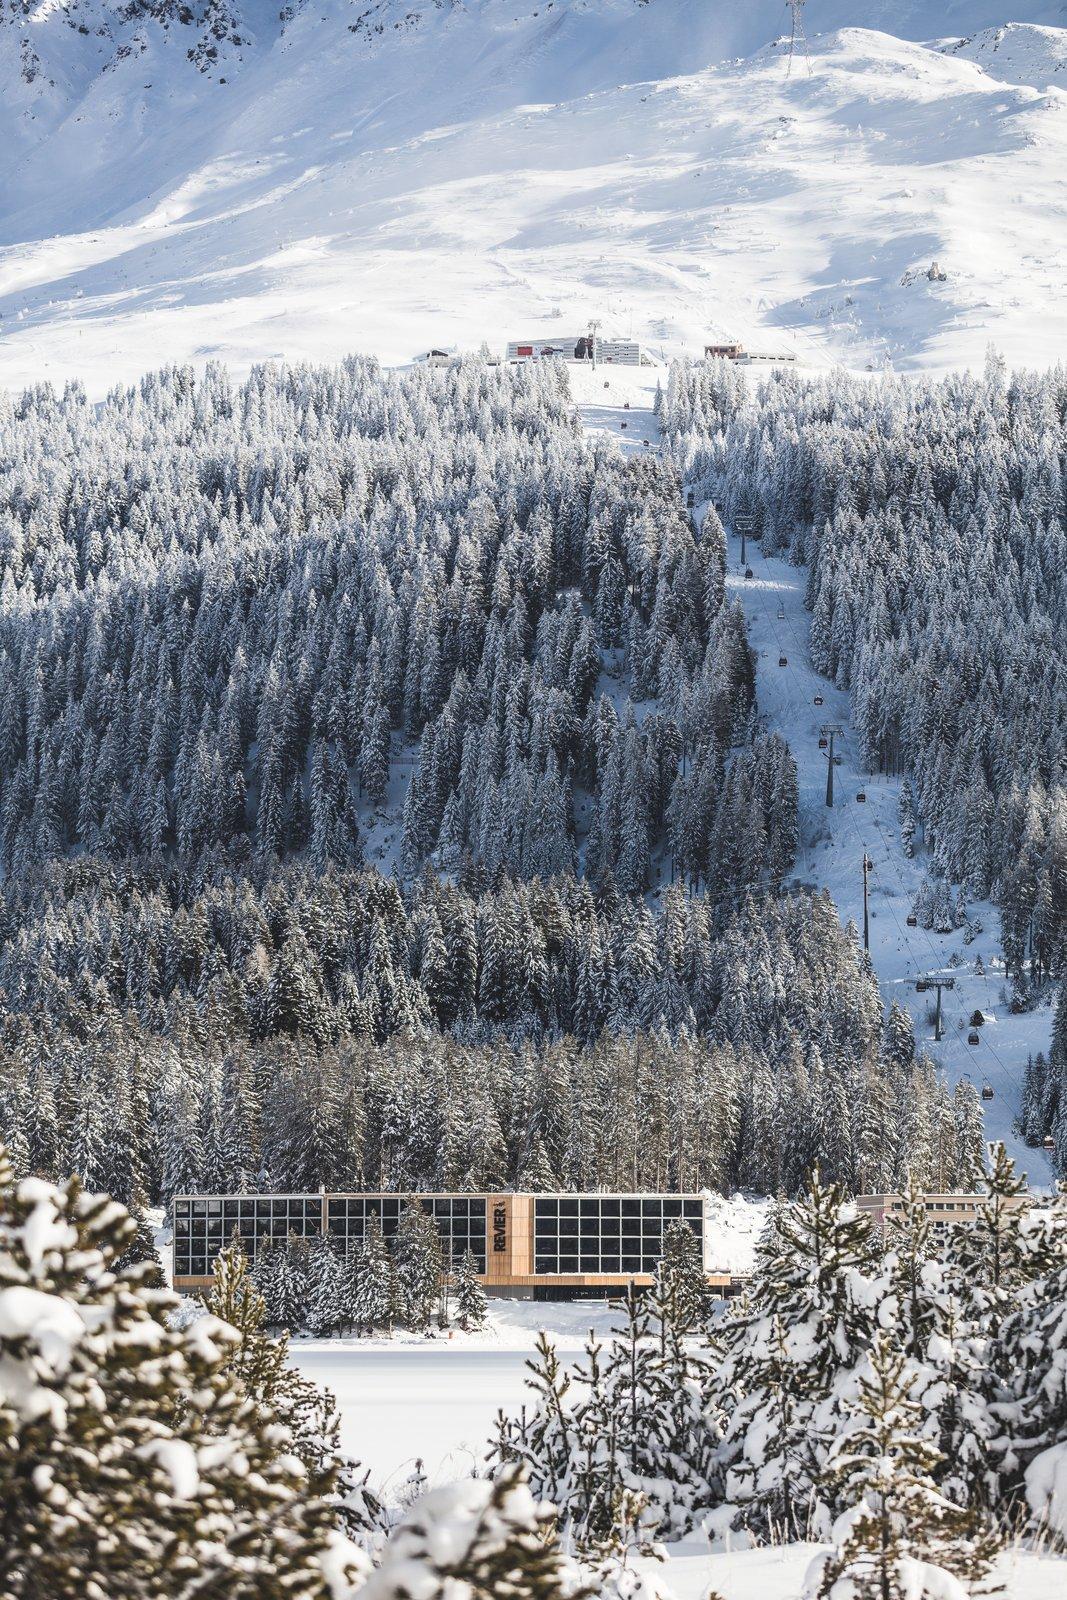 The modern ski chalet in its snowy alpine setting.